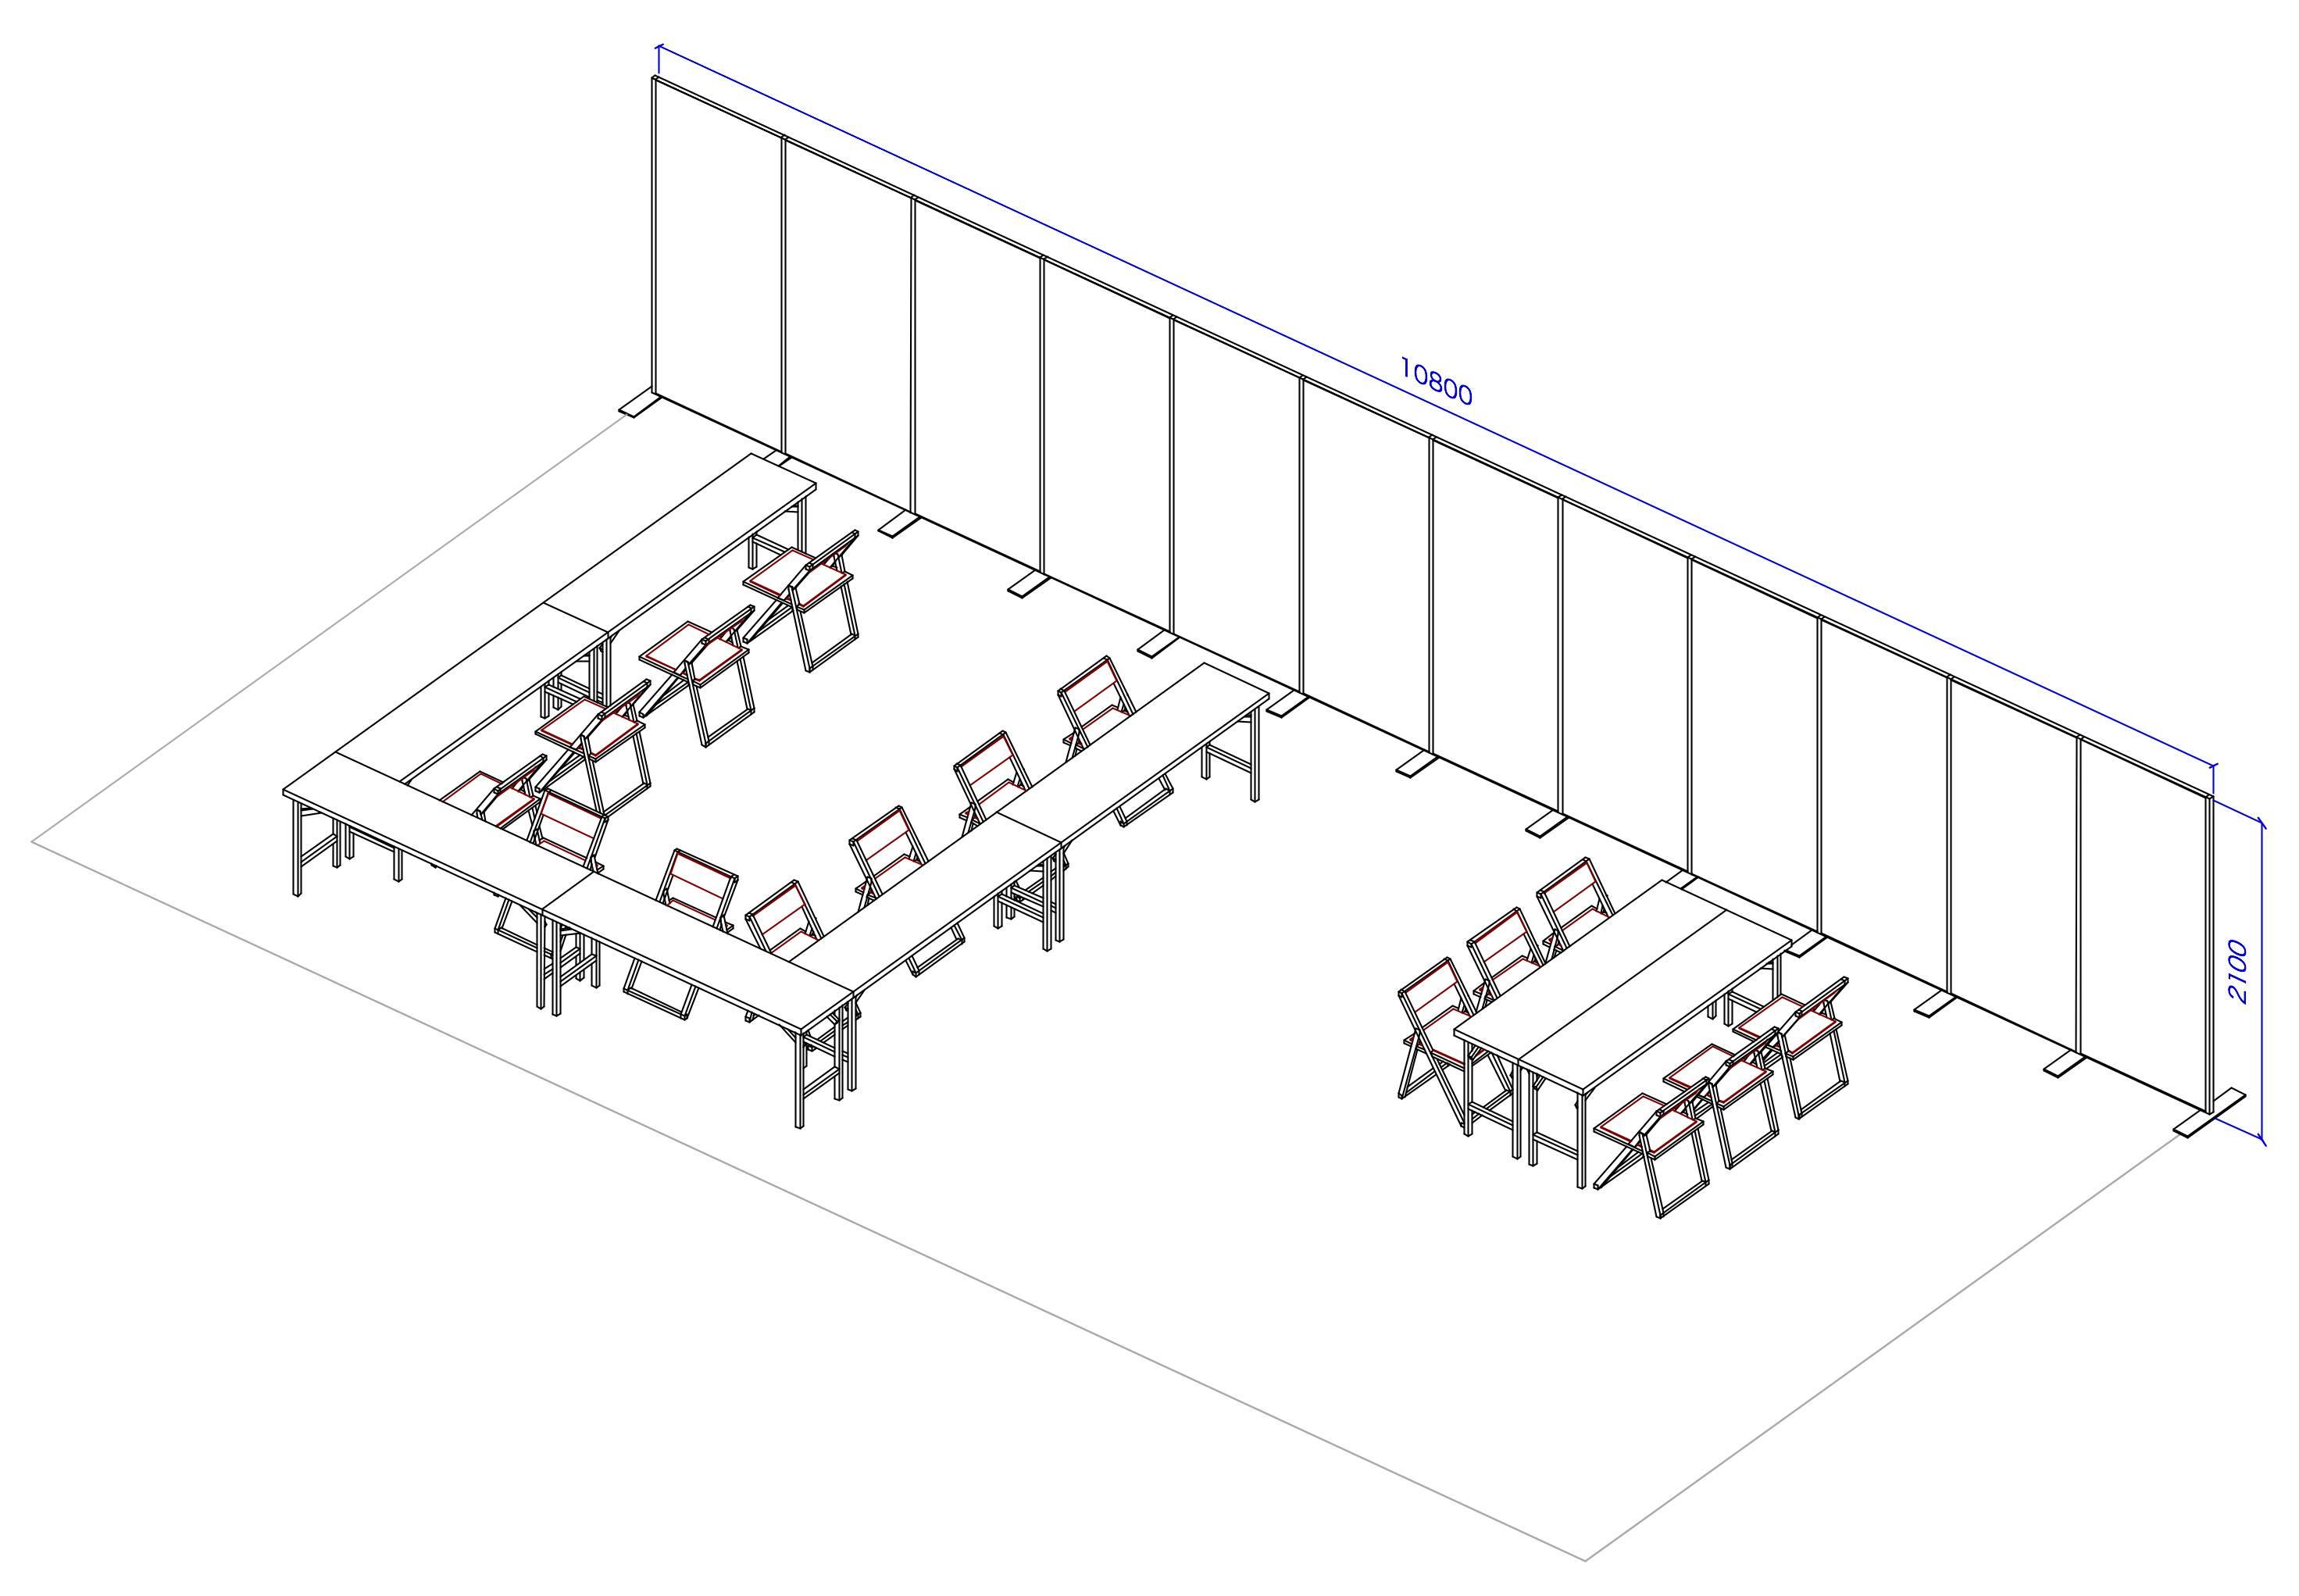 D2 販売スペース6 試遊スペース1